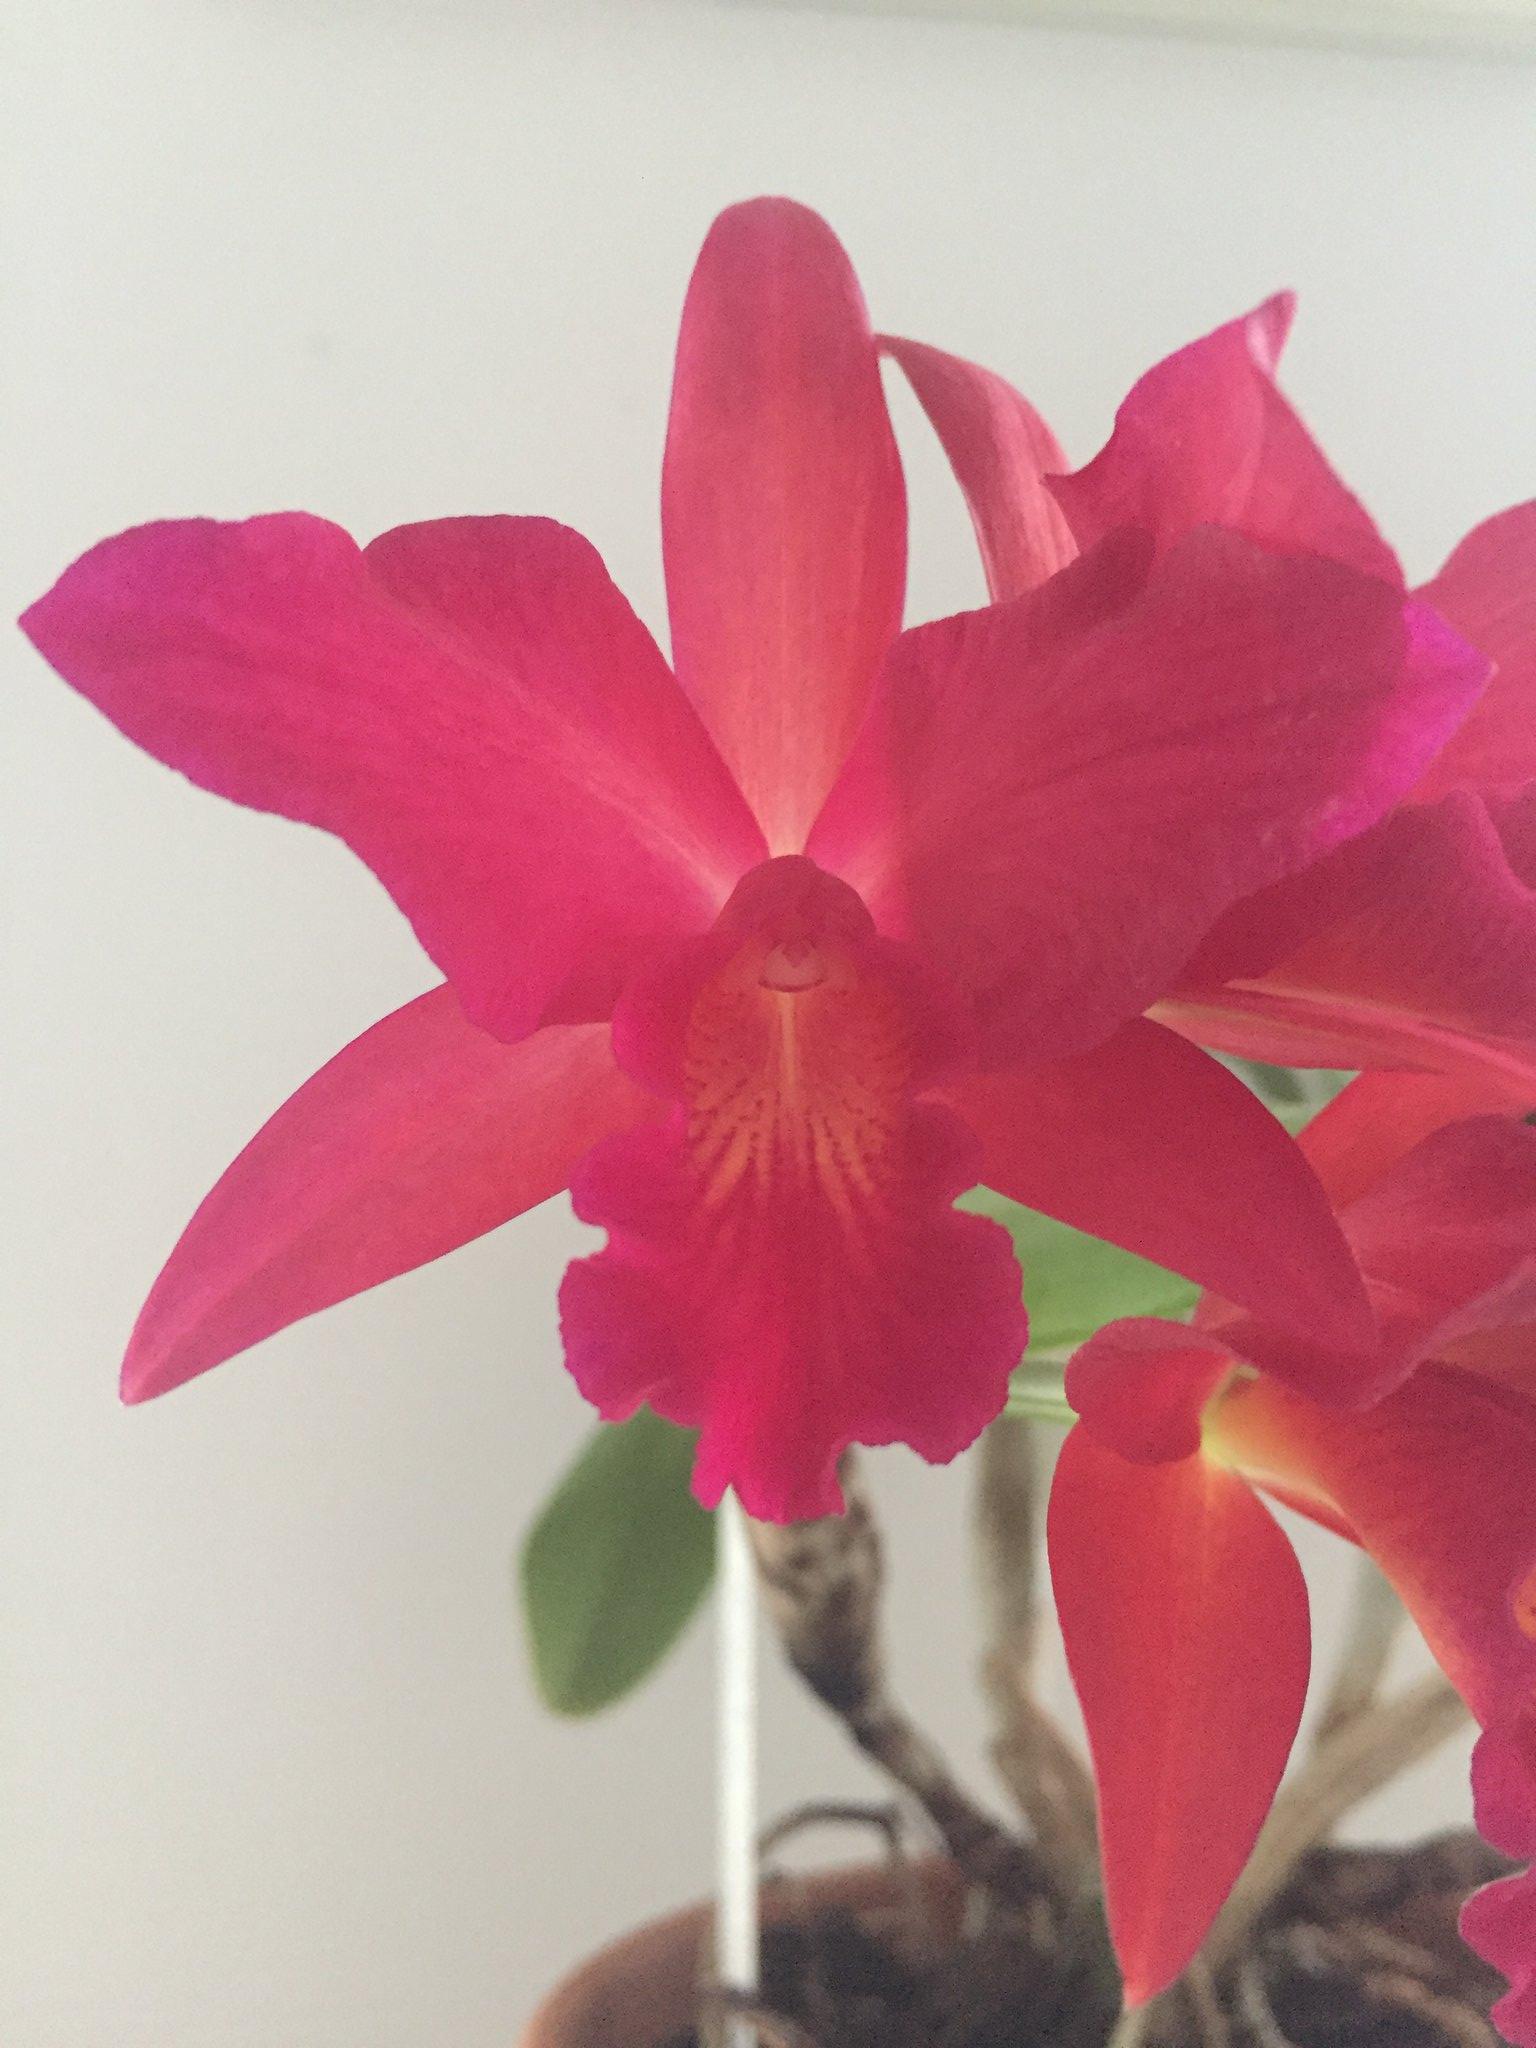 Cattlianthe Jewel Box 'Scheherazade' AM/AOS 40991268365_4c411c7459_k